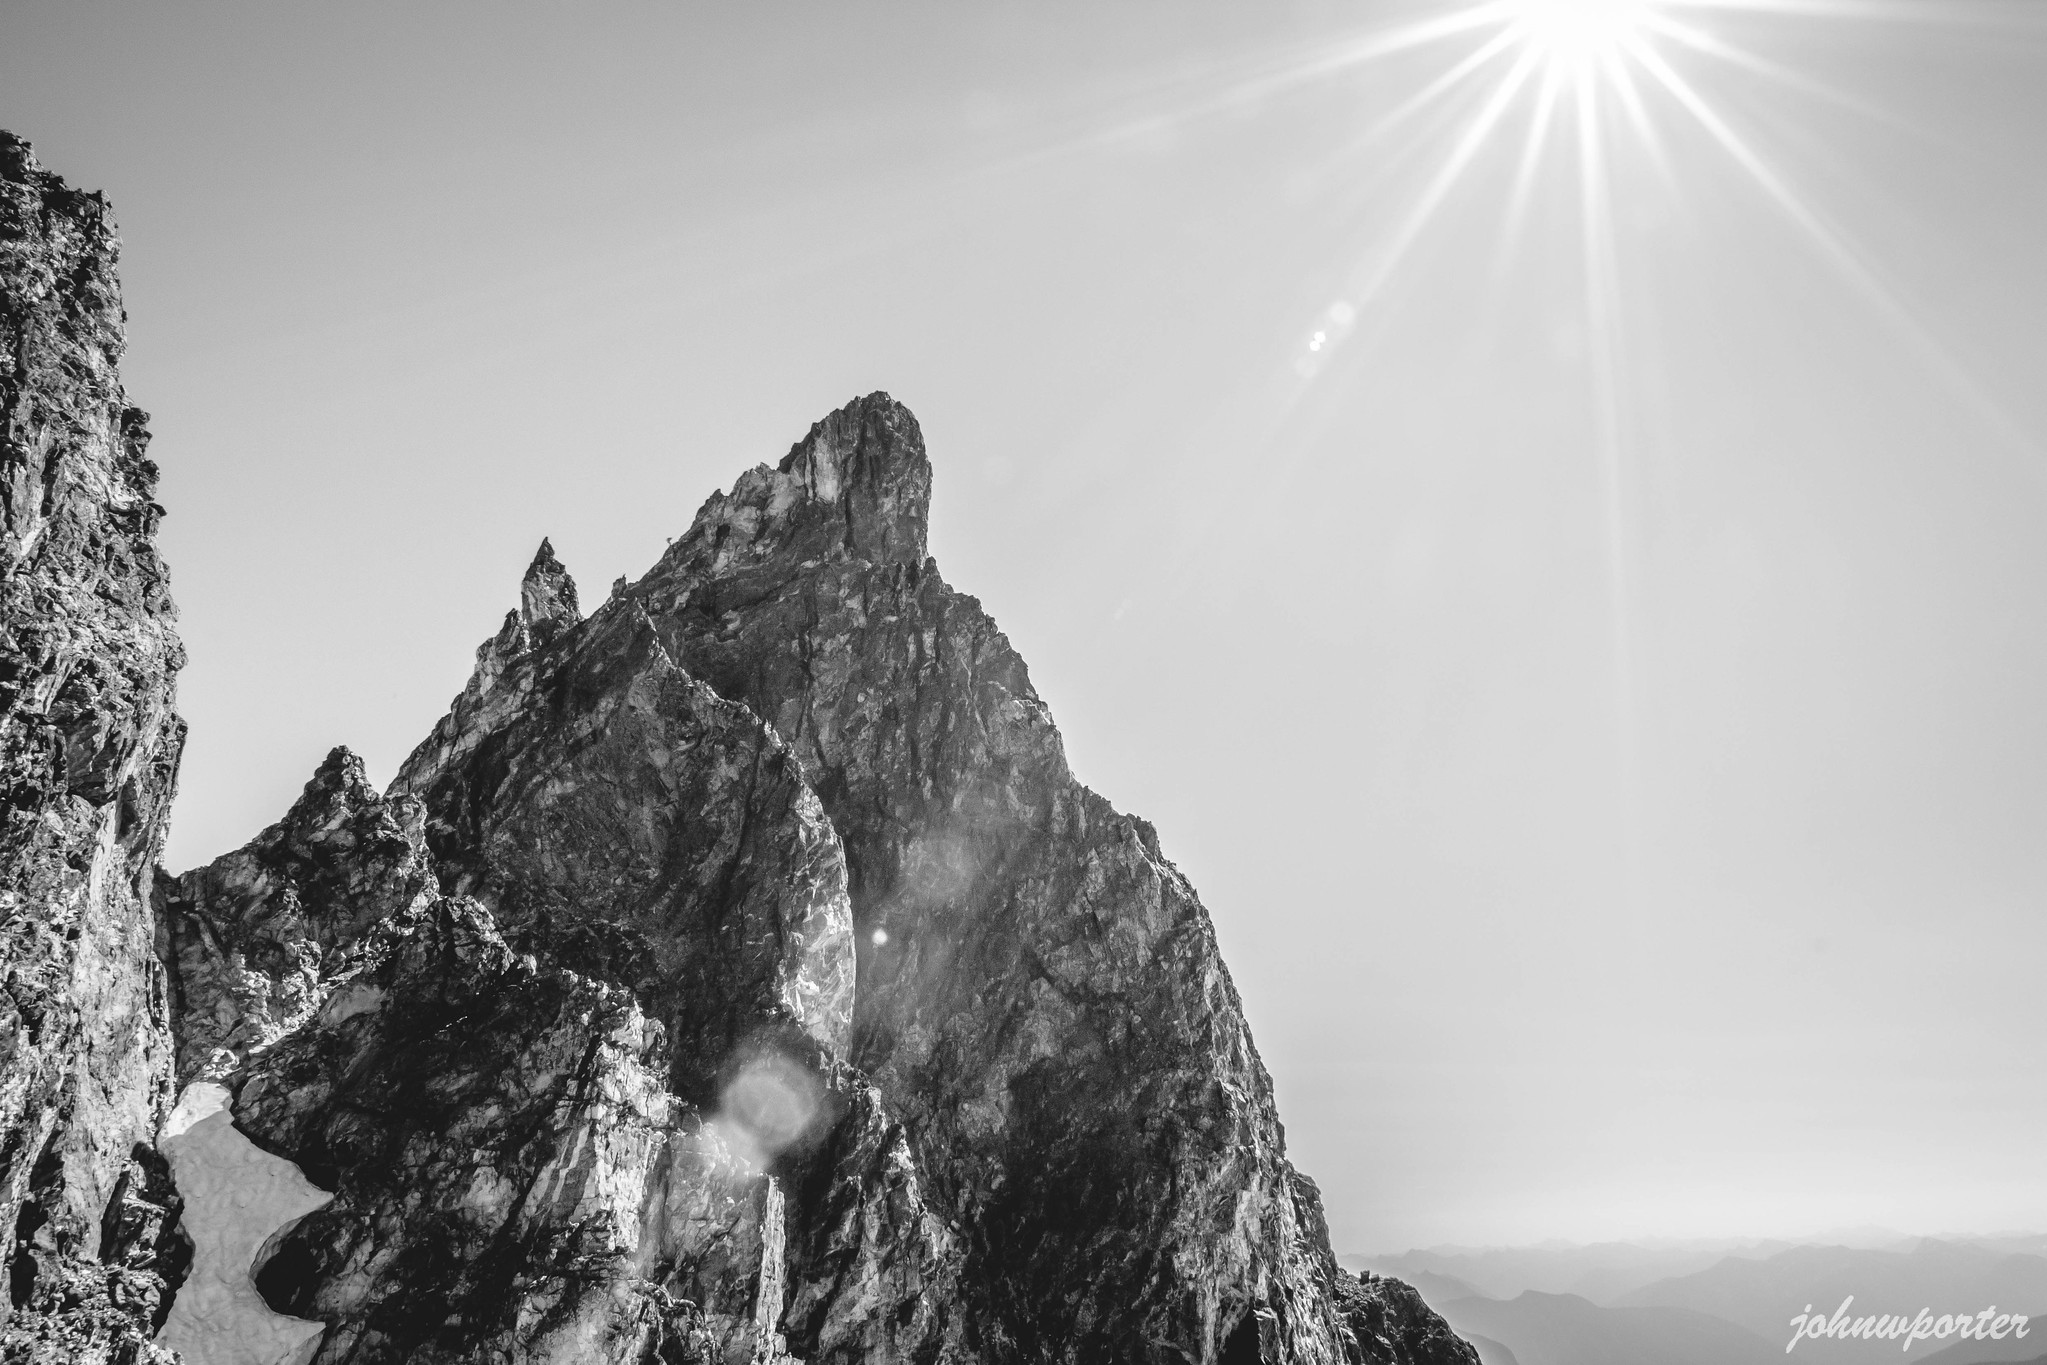 Southeast Mox Peak spire